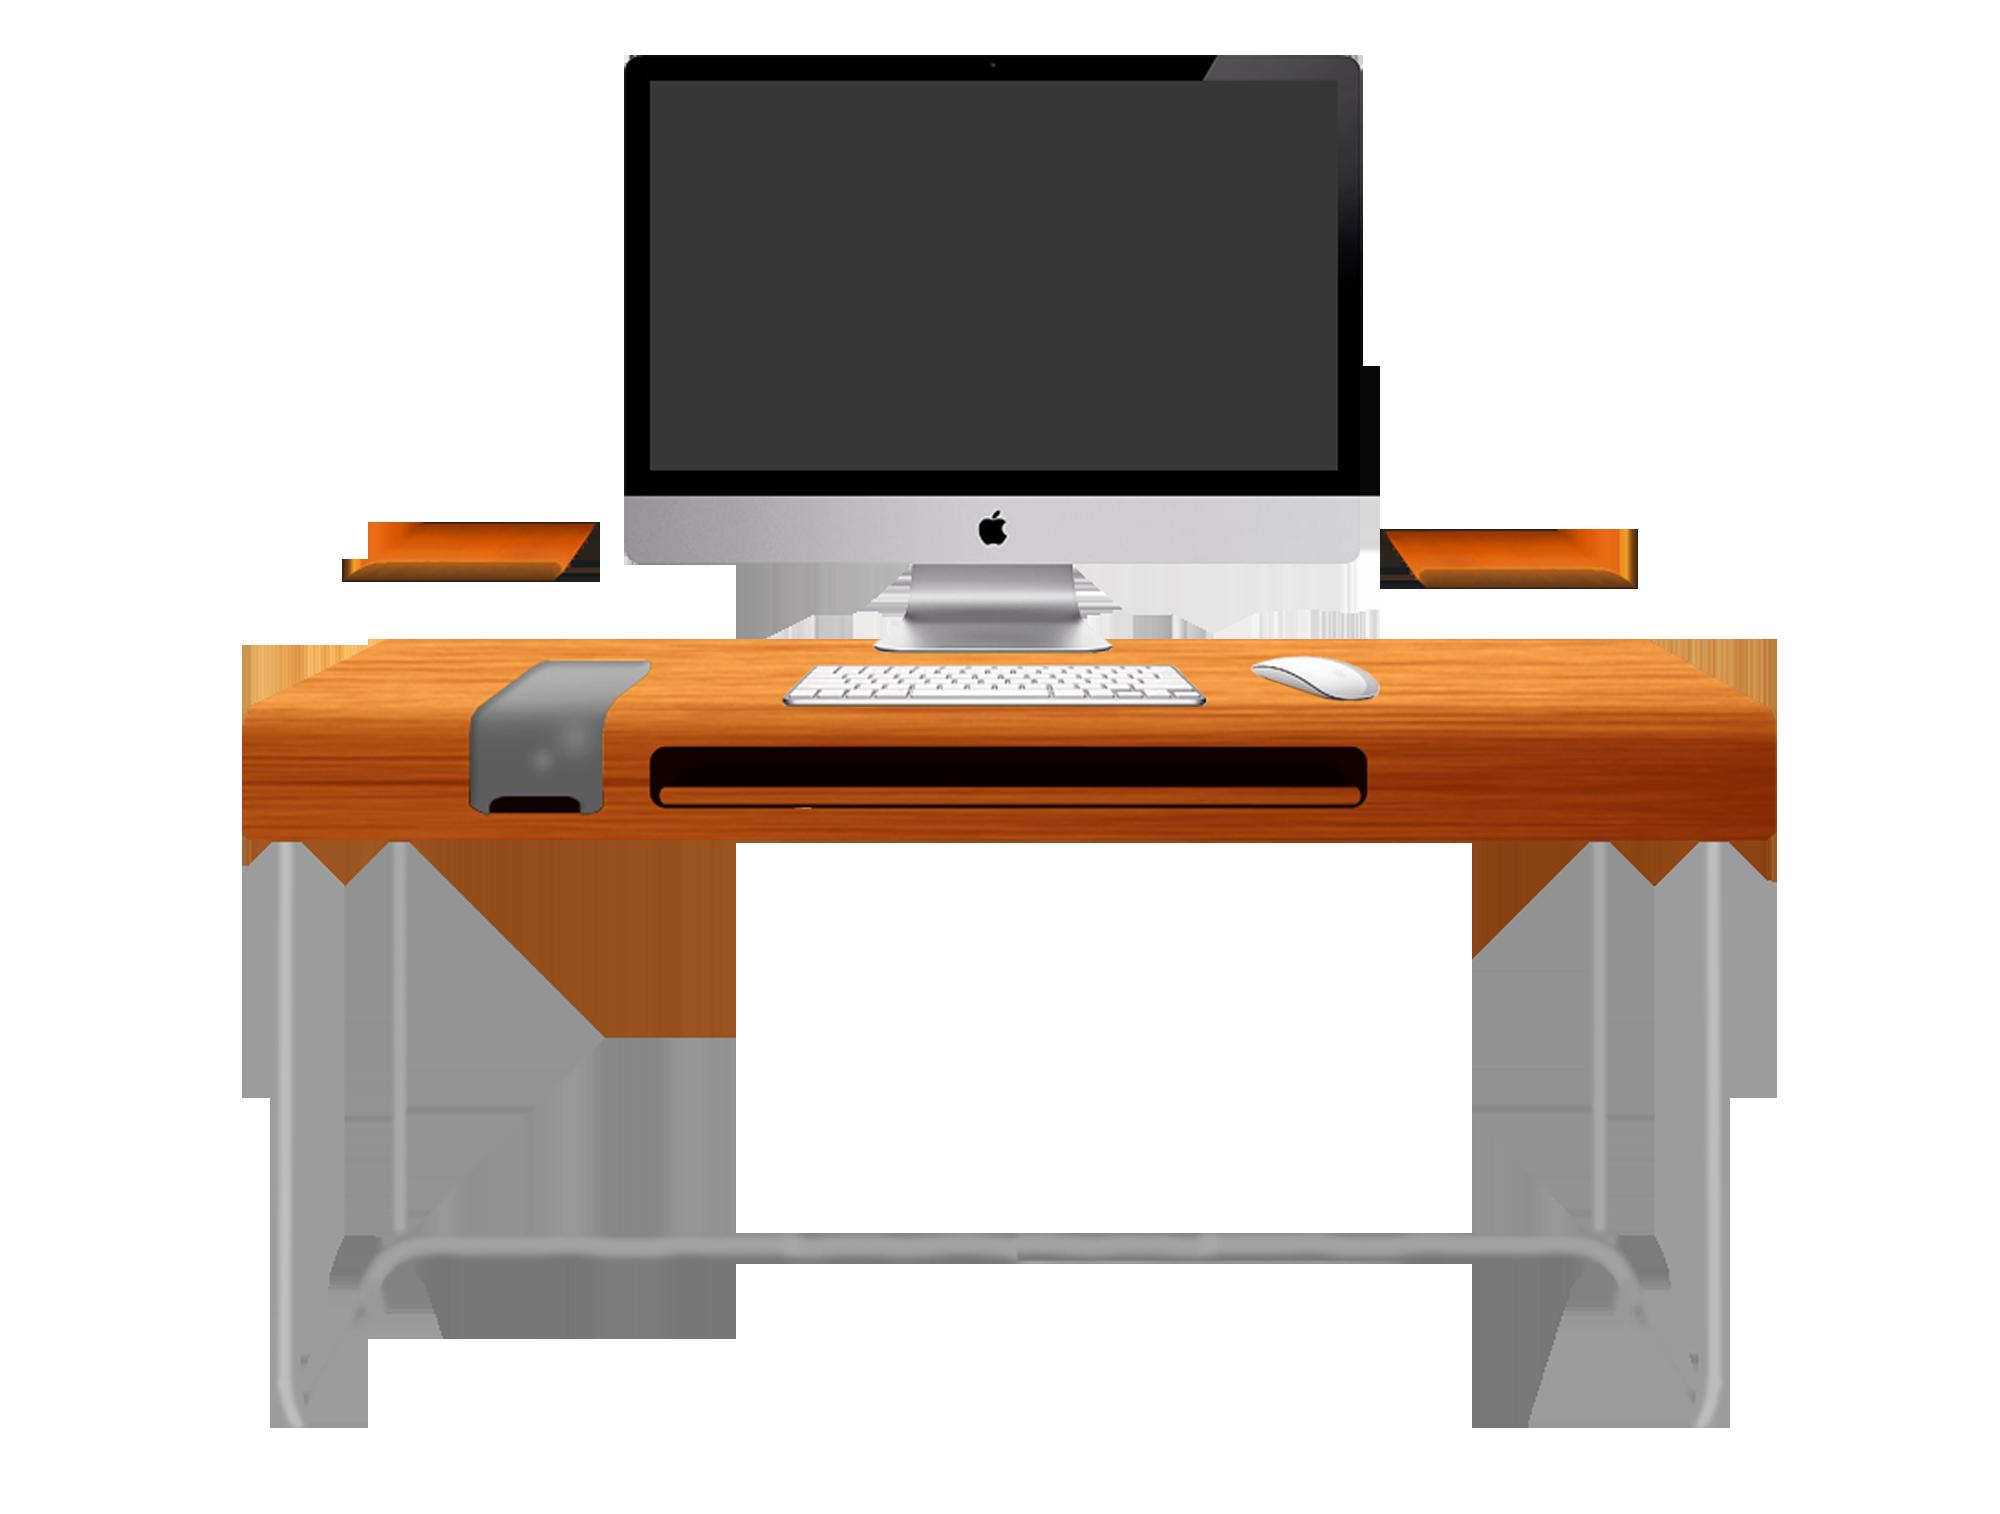 Computer Desk Modern | Clipart Panda - Free Clipart Images